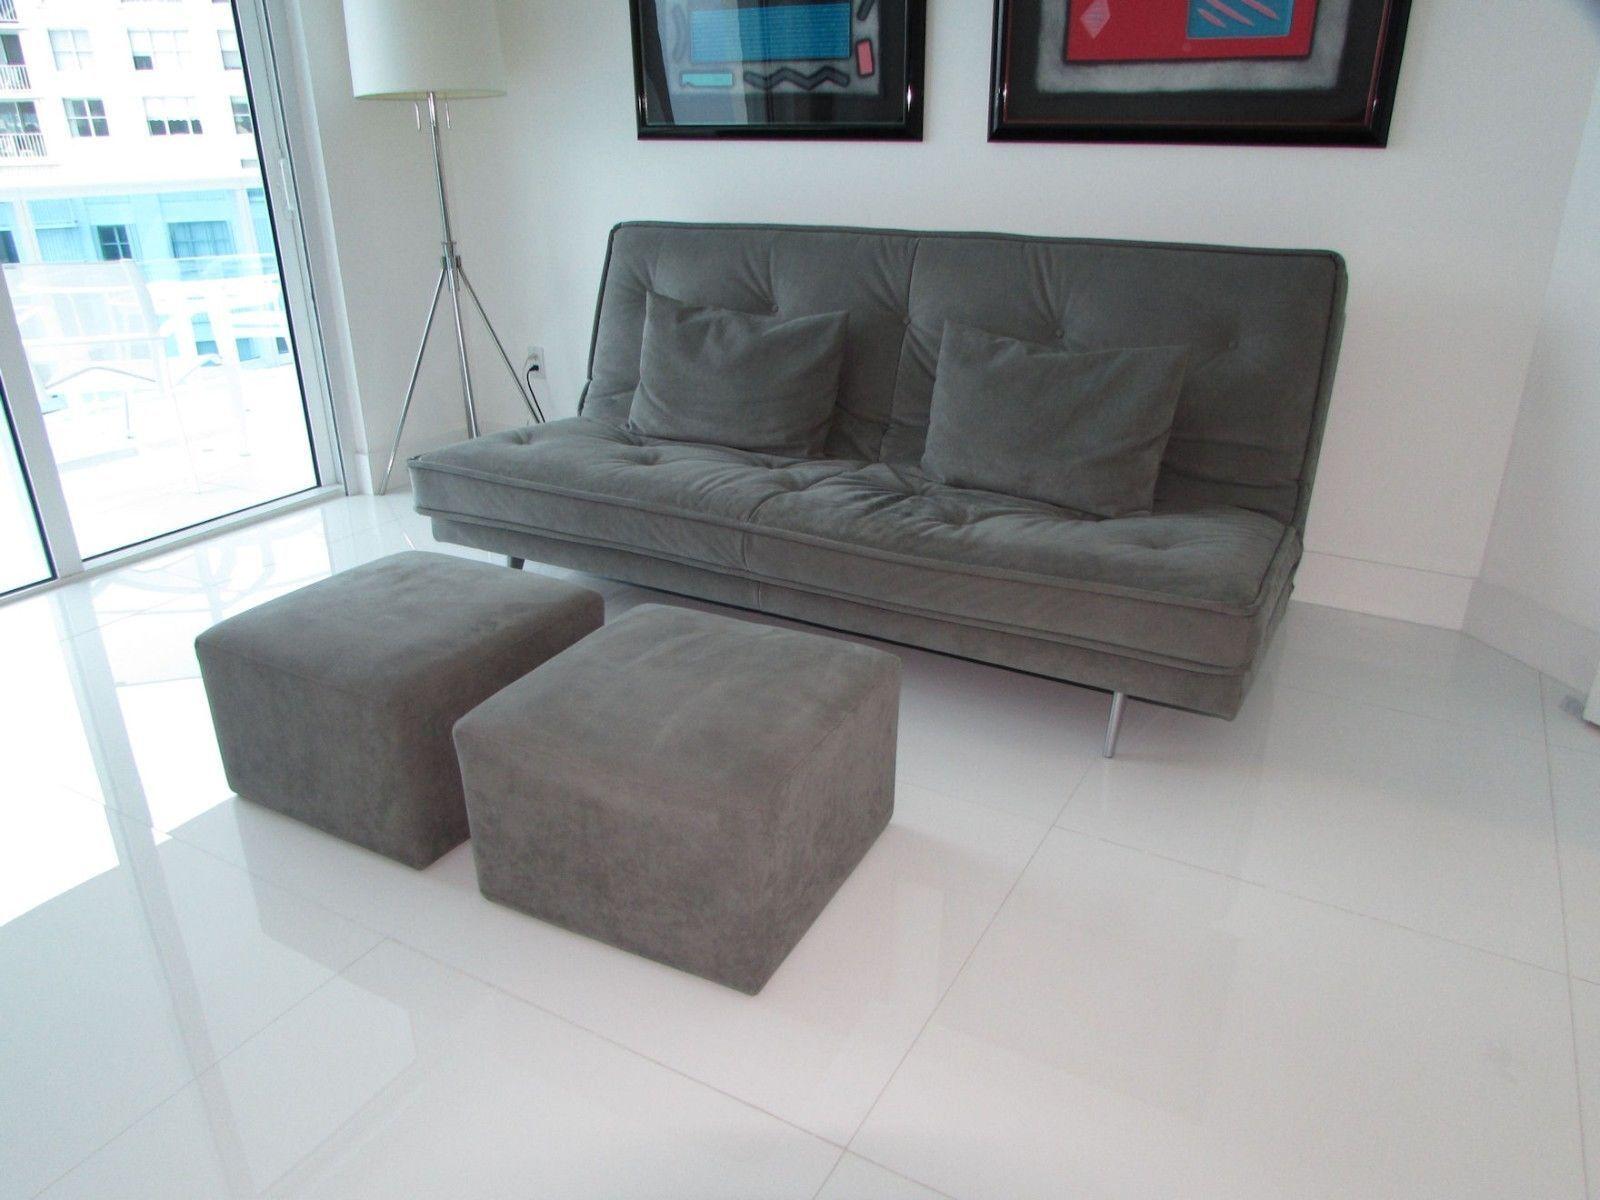 ligne roset nomade sofa bed reviews australia top 10 beds ebay